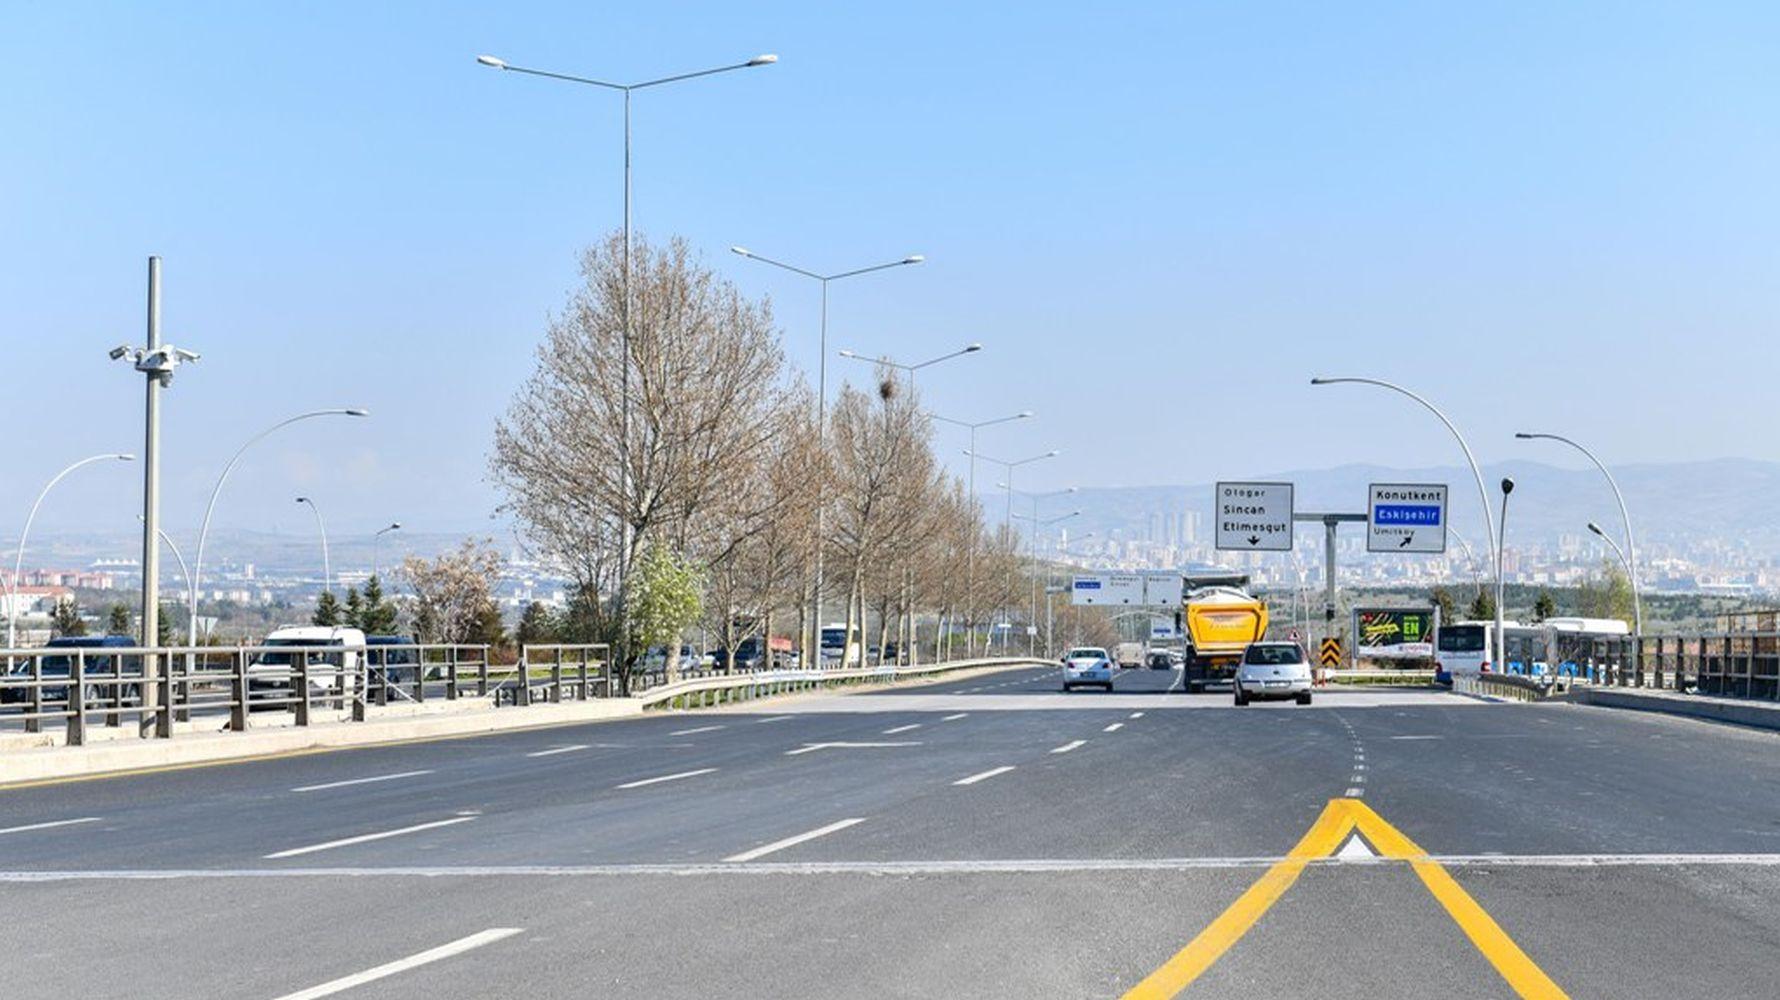 Joint renovation works on bridges continue